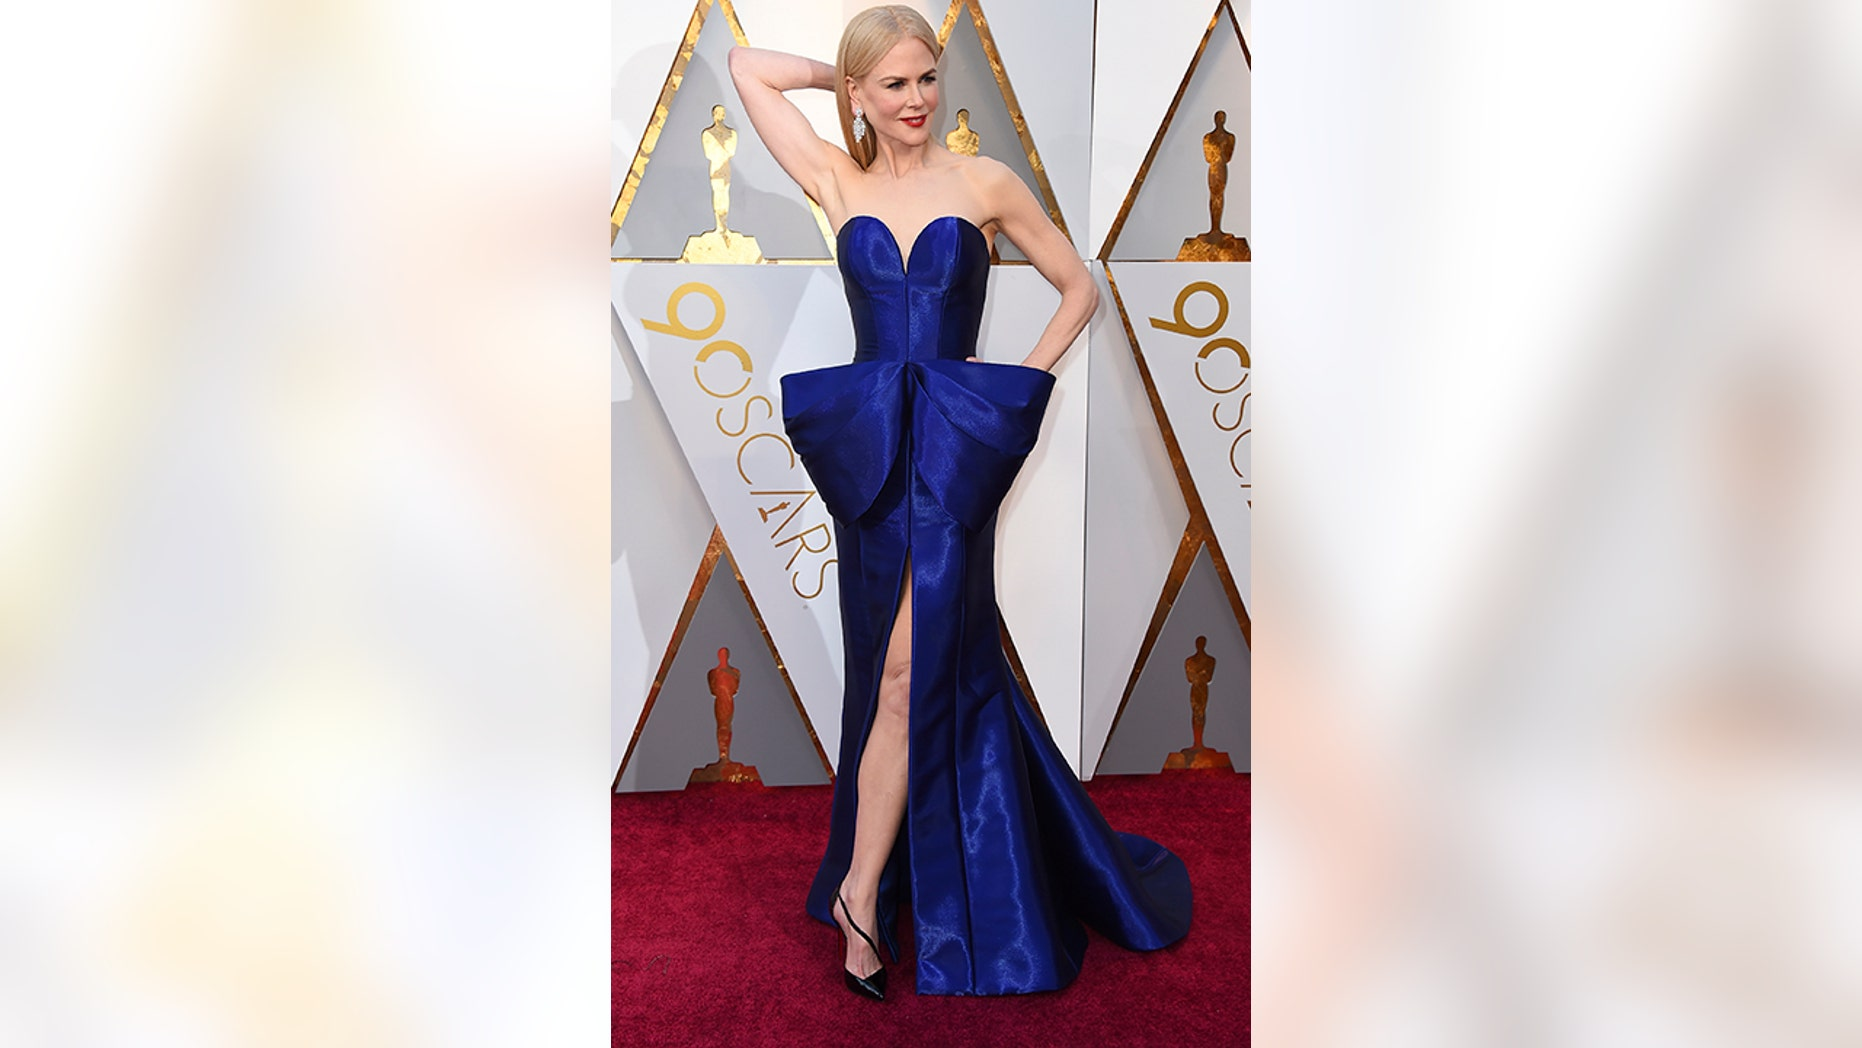 Nicole Kidman's deep blue gown stole the show.